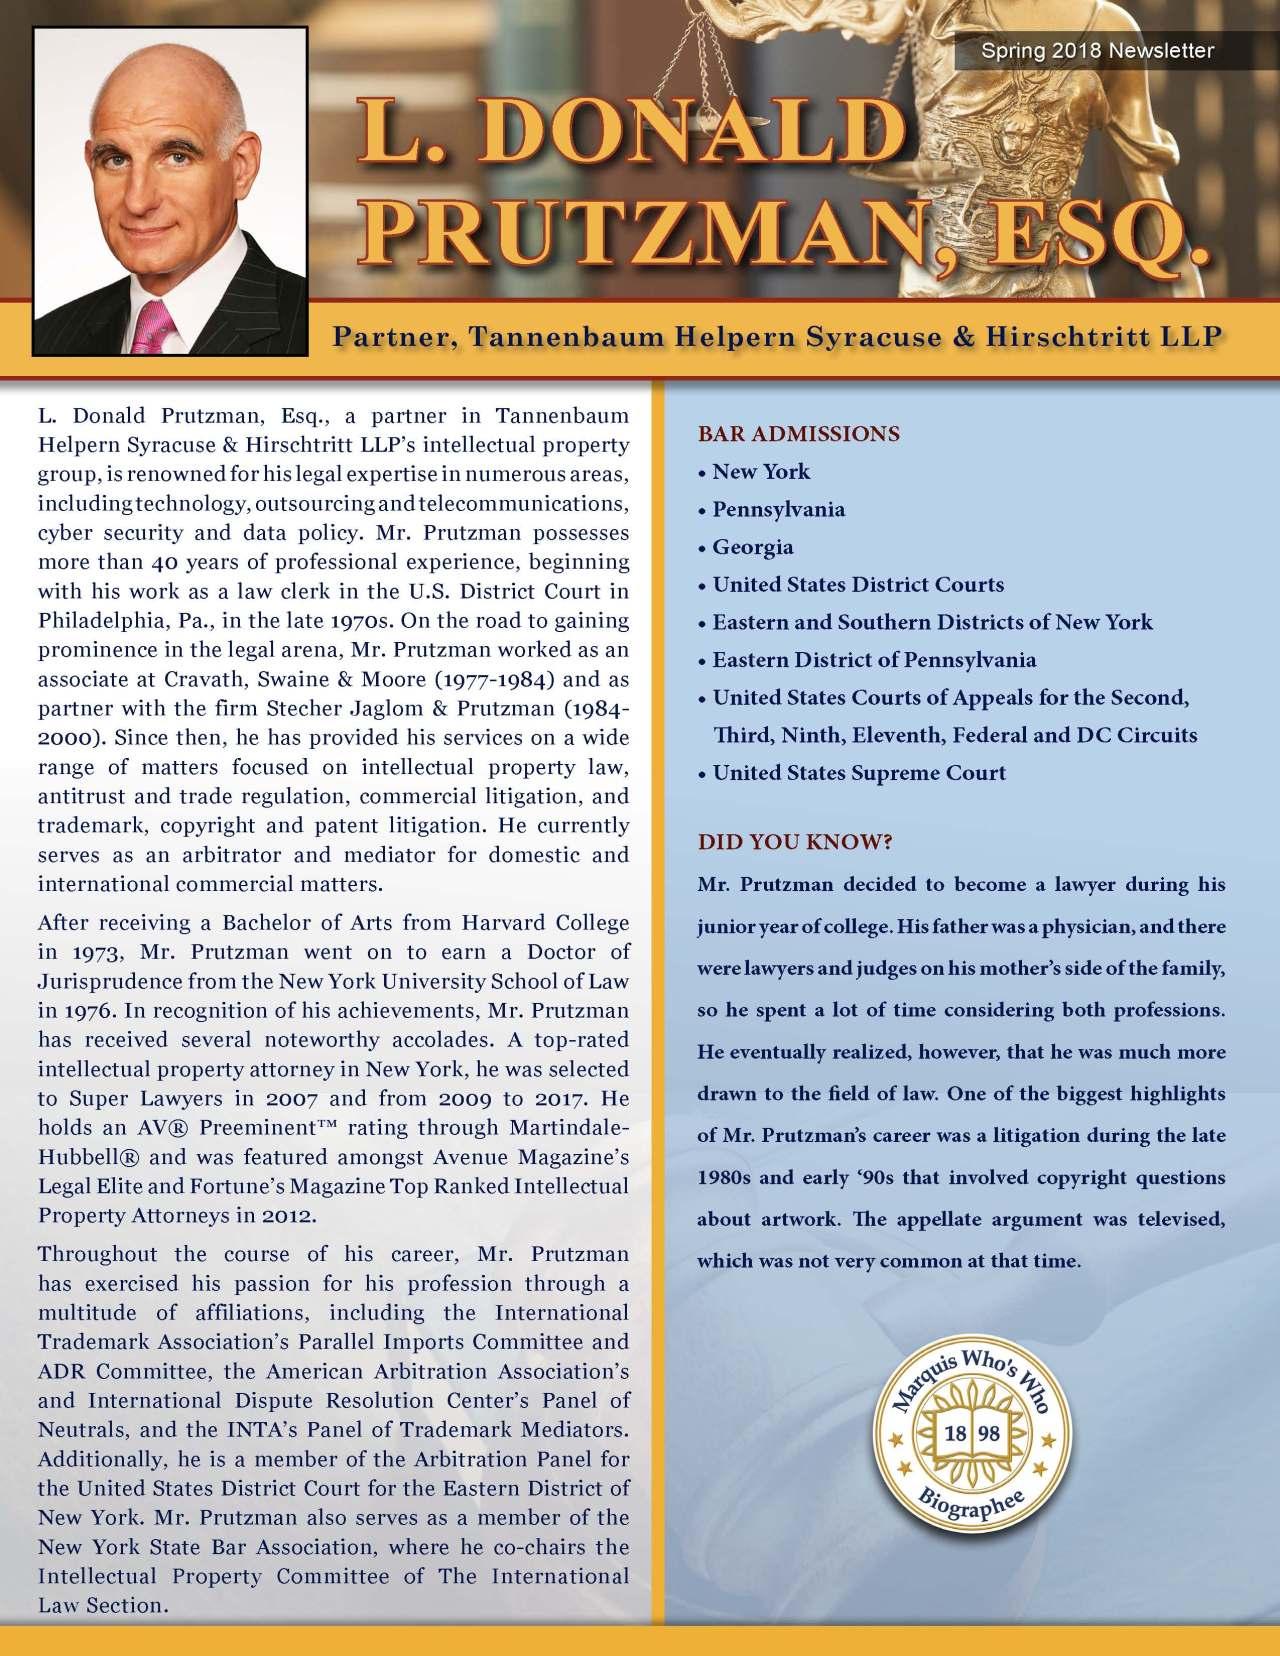 Prutzman, L. Donald 3685297_4003685297 Newsletter REVISED.jpg